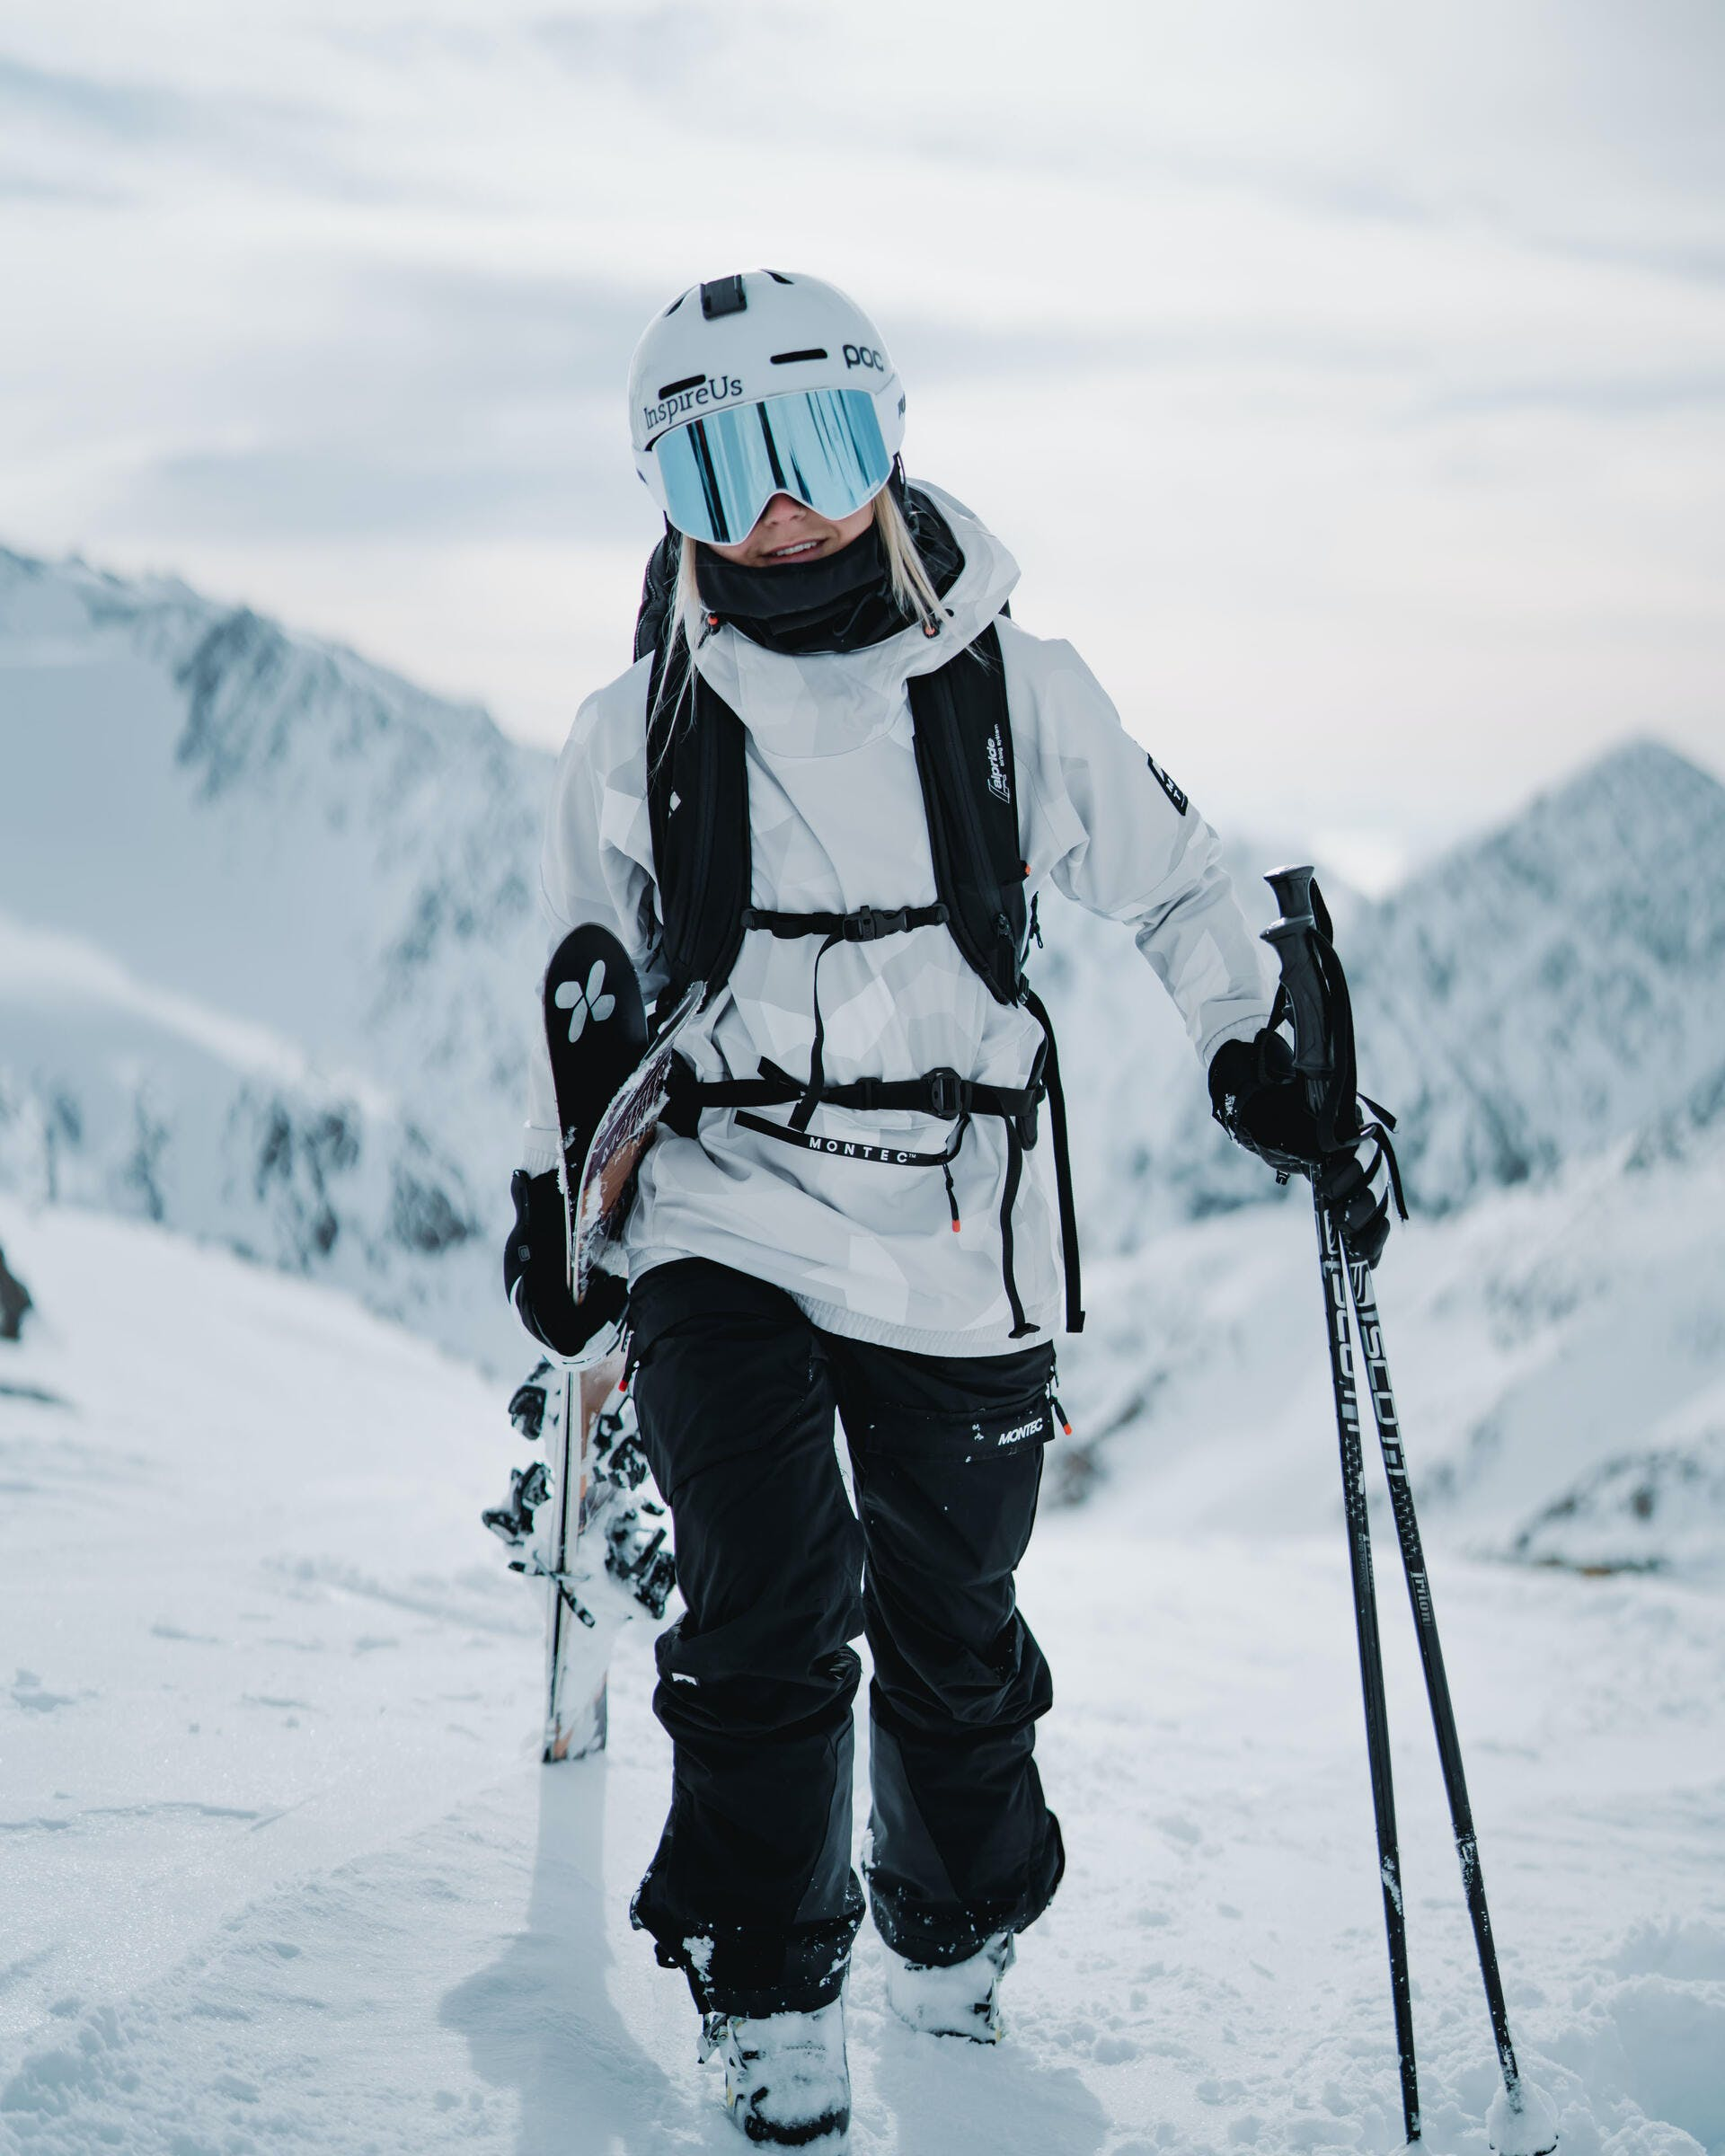 Protective Equipment for Freeride Skiing Checklist   Ridestore Magazine